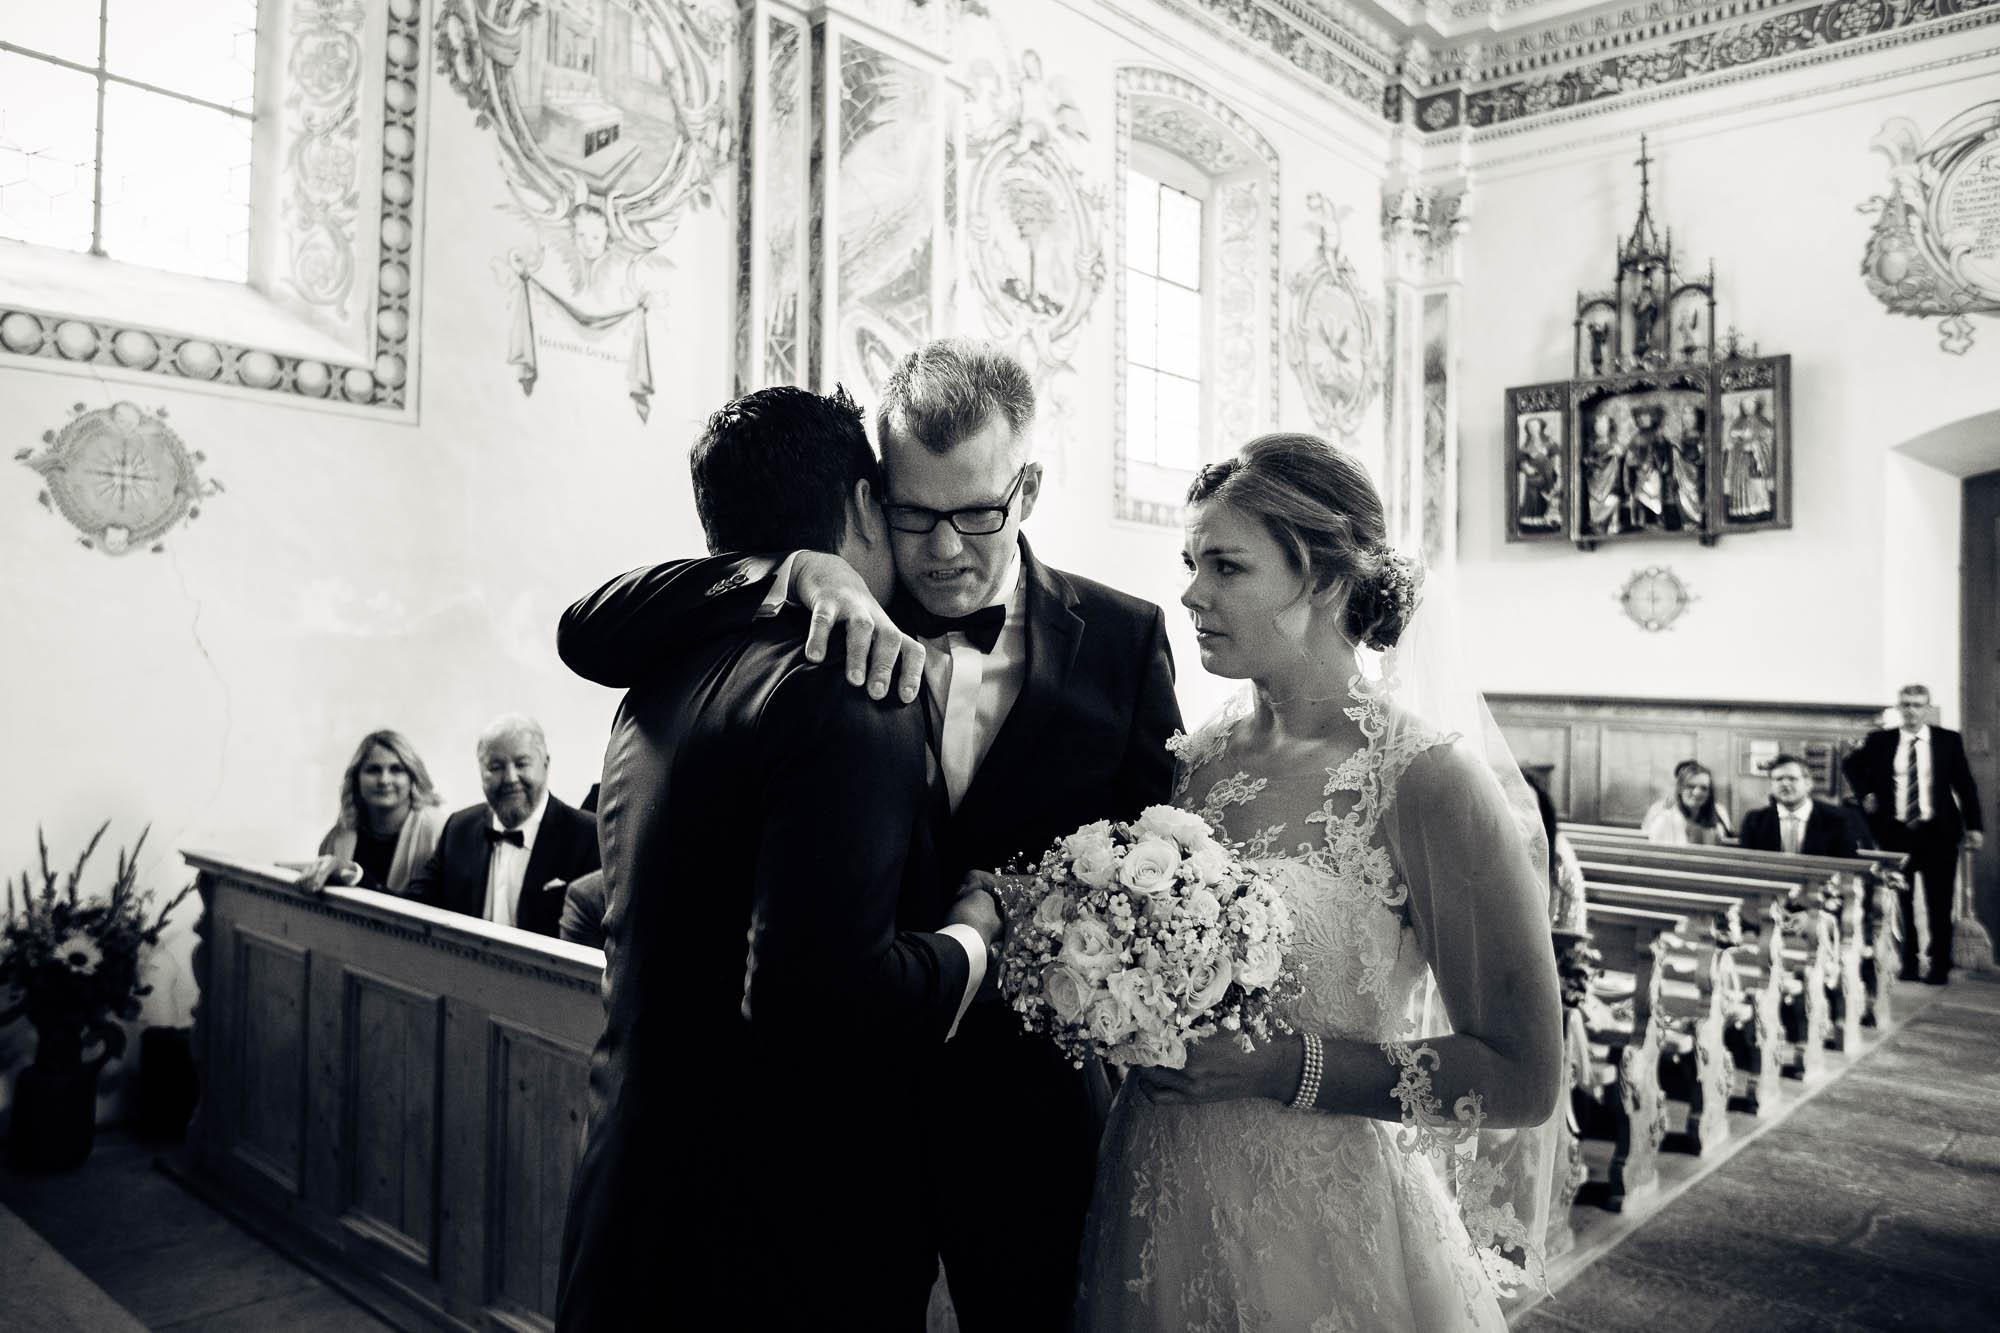 Bruder übergibt Braut dem Bräutigam